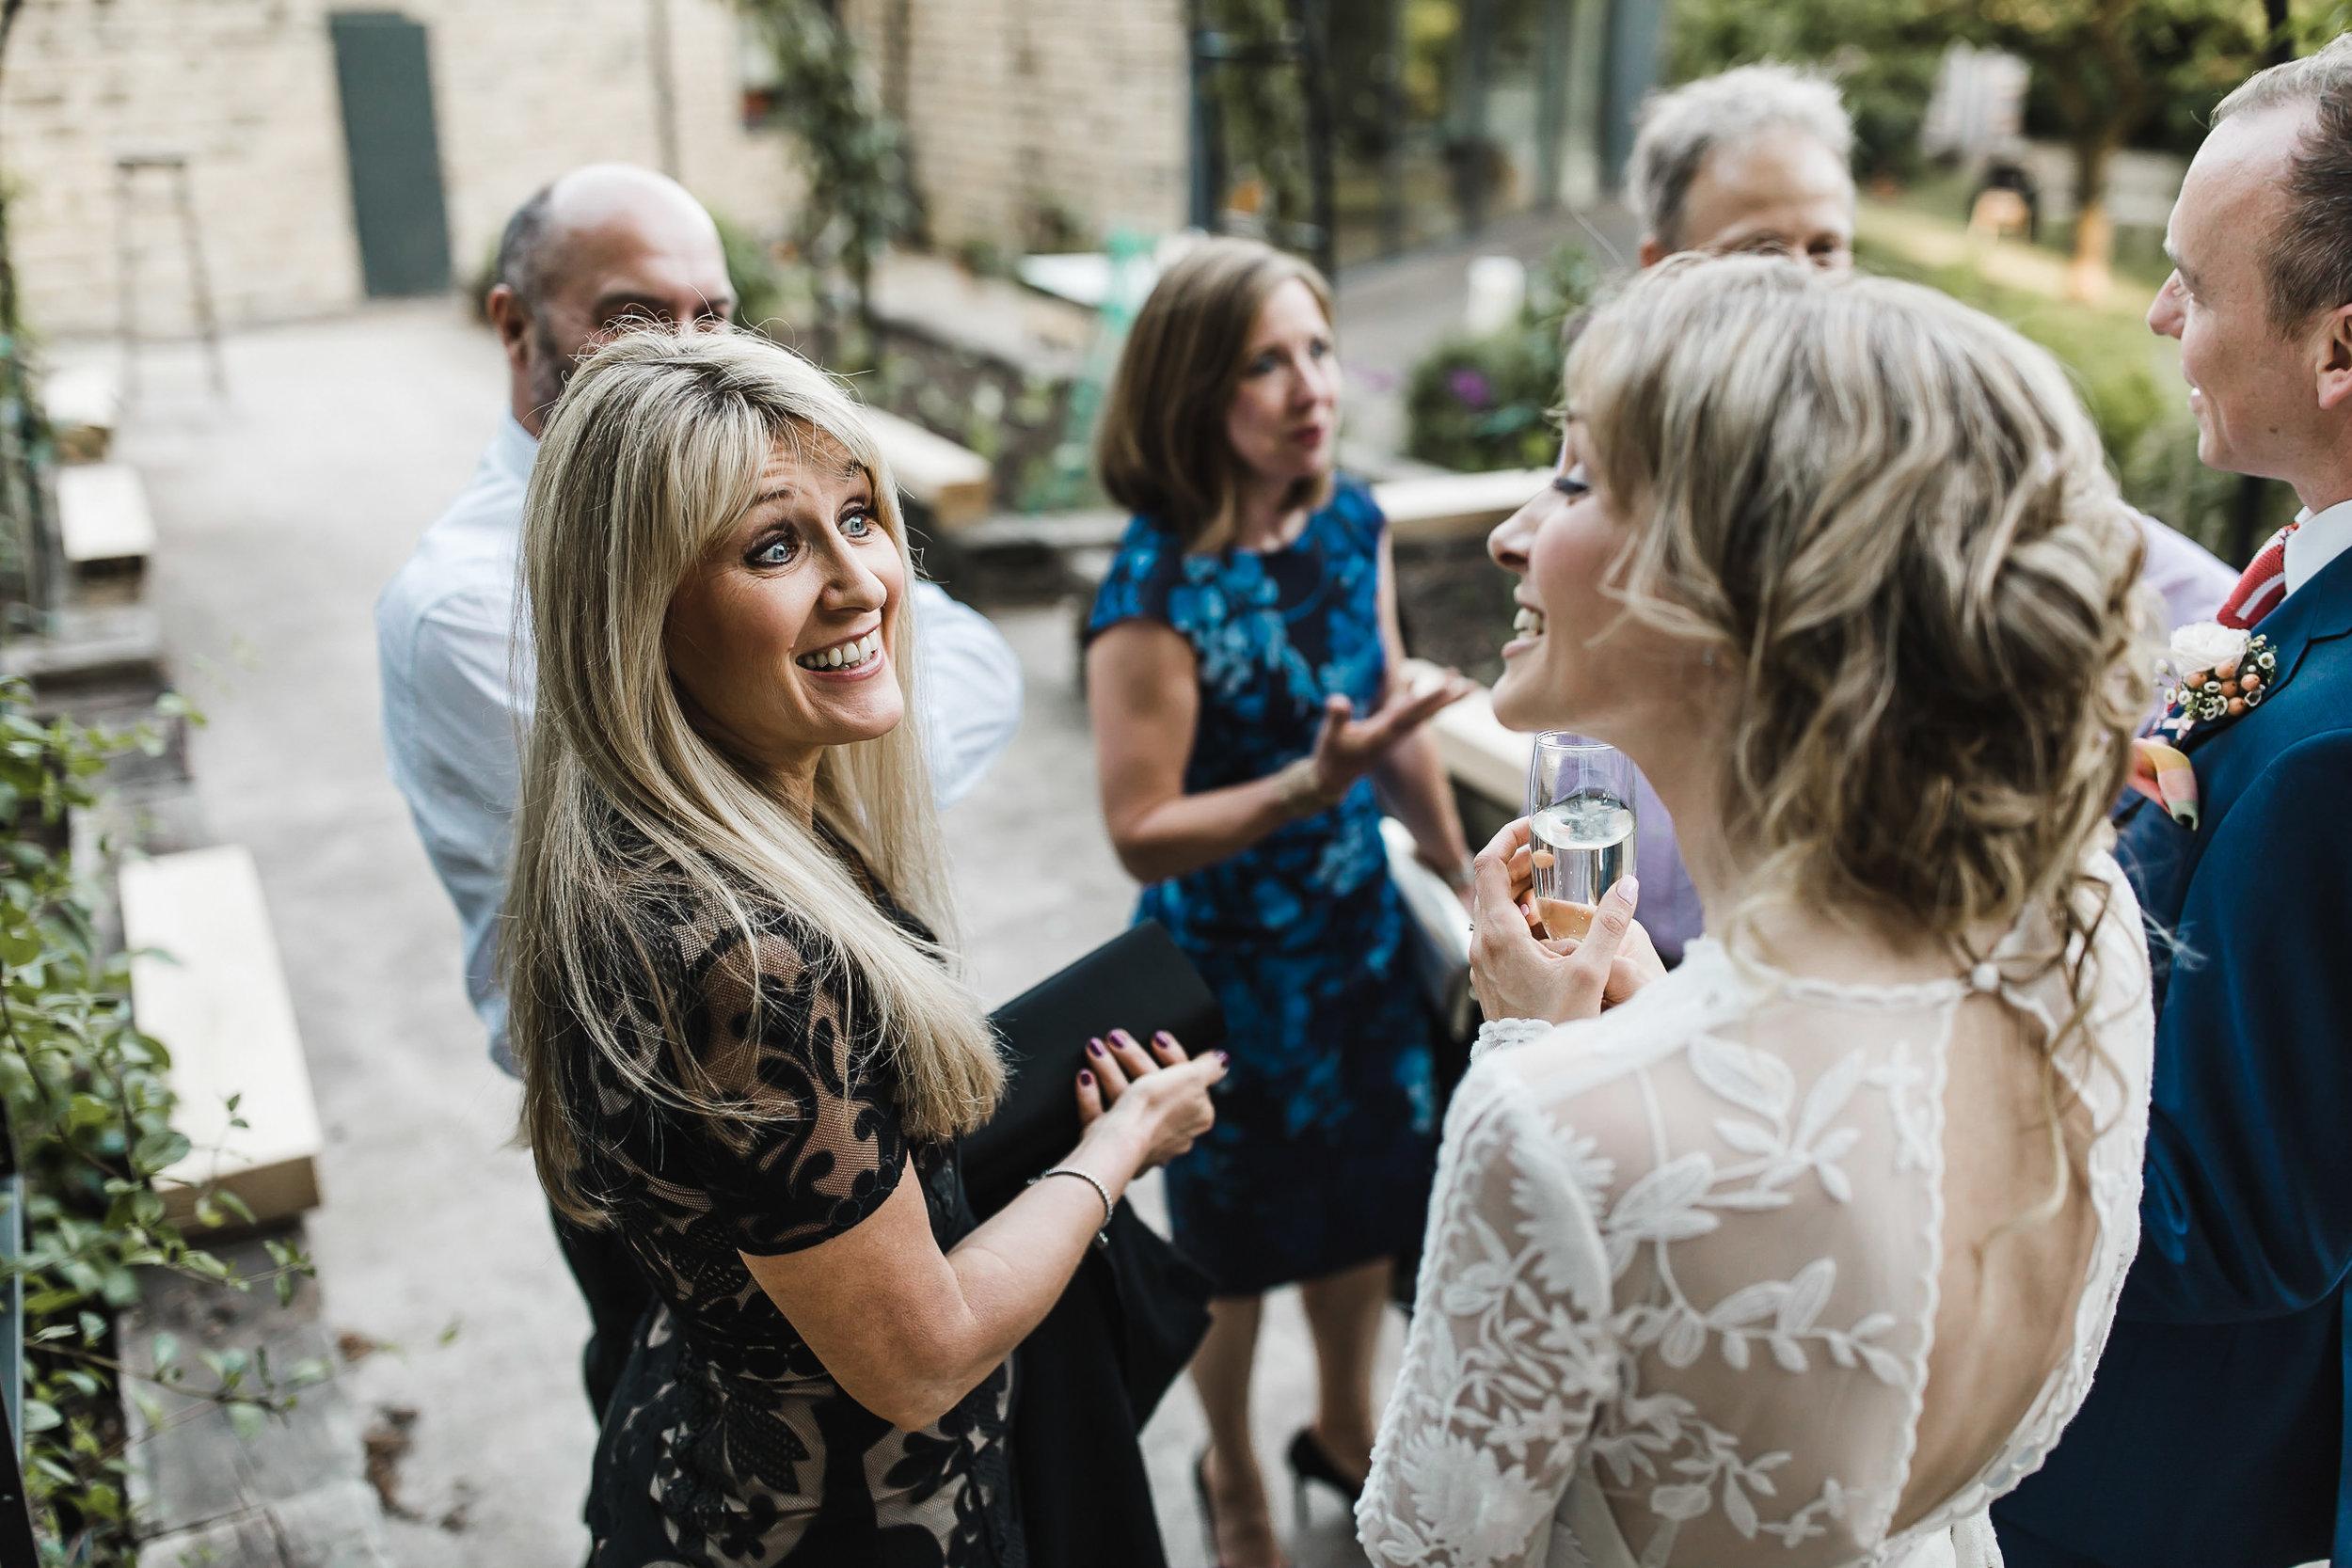 Roundhay-Leeds-Backyard-Wedding-Becs-Chris-215.jpg